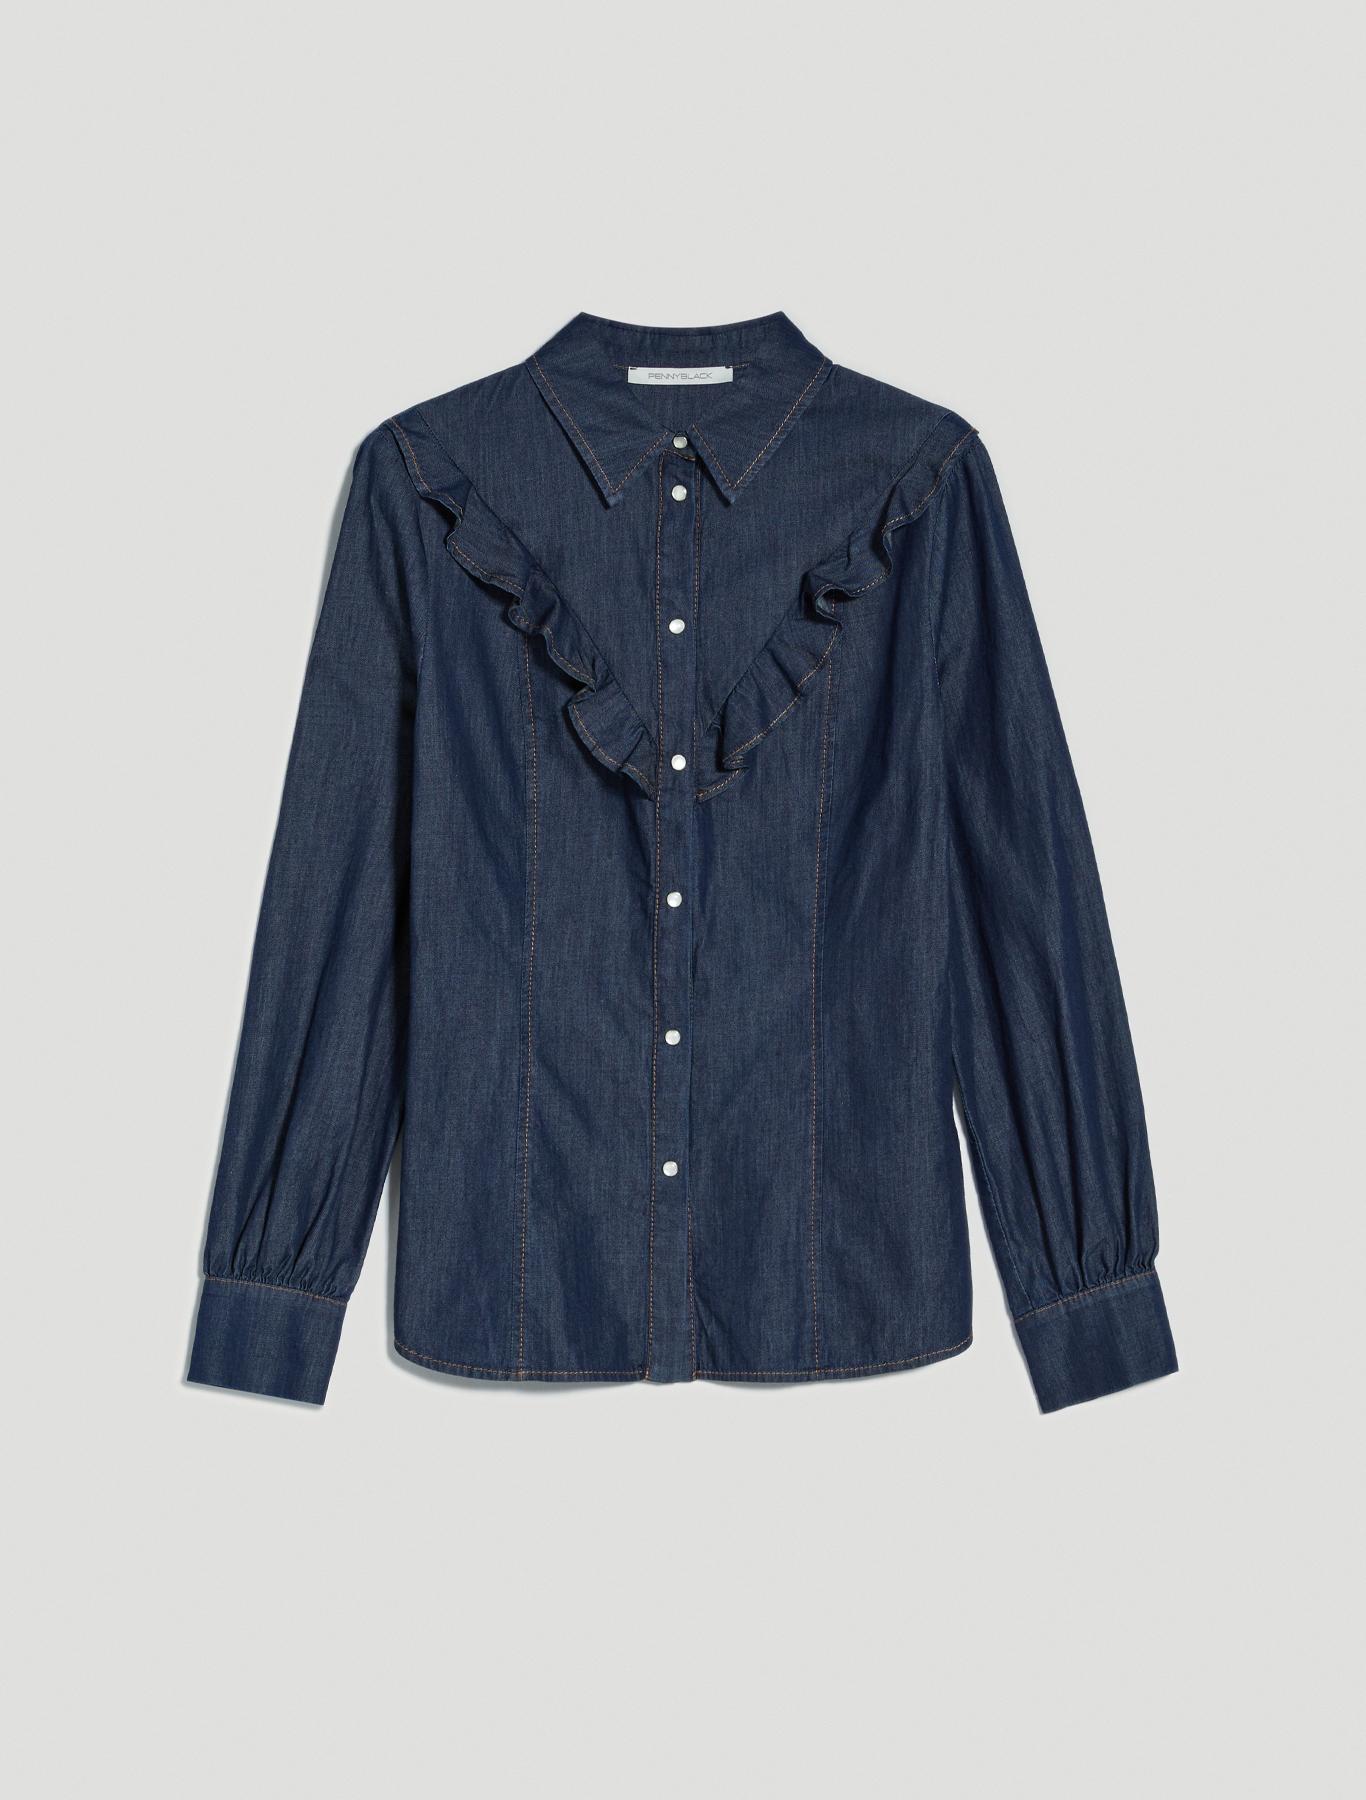 Denim shirt with ruches - midnight blue - pennyblack